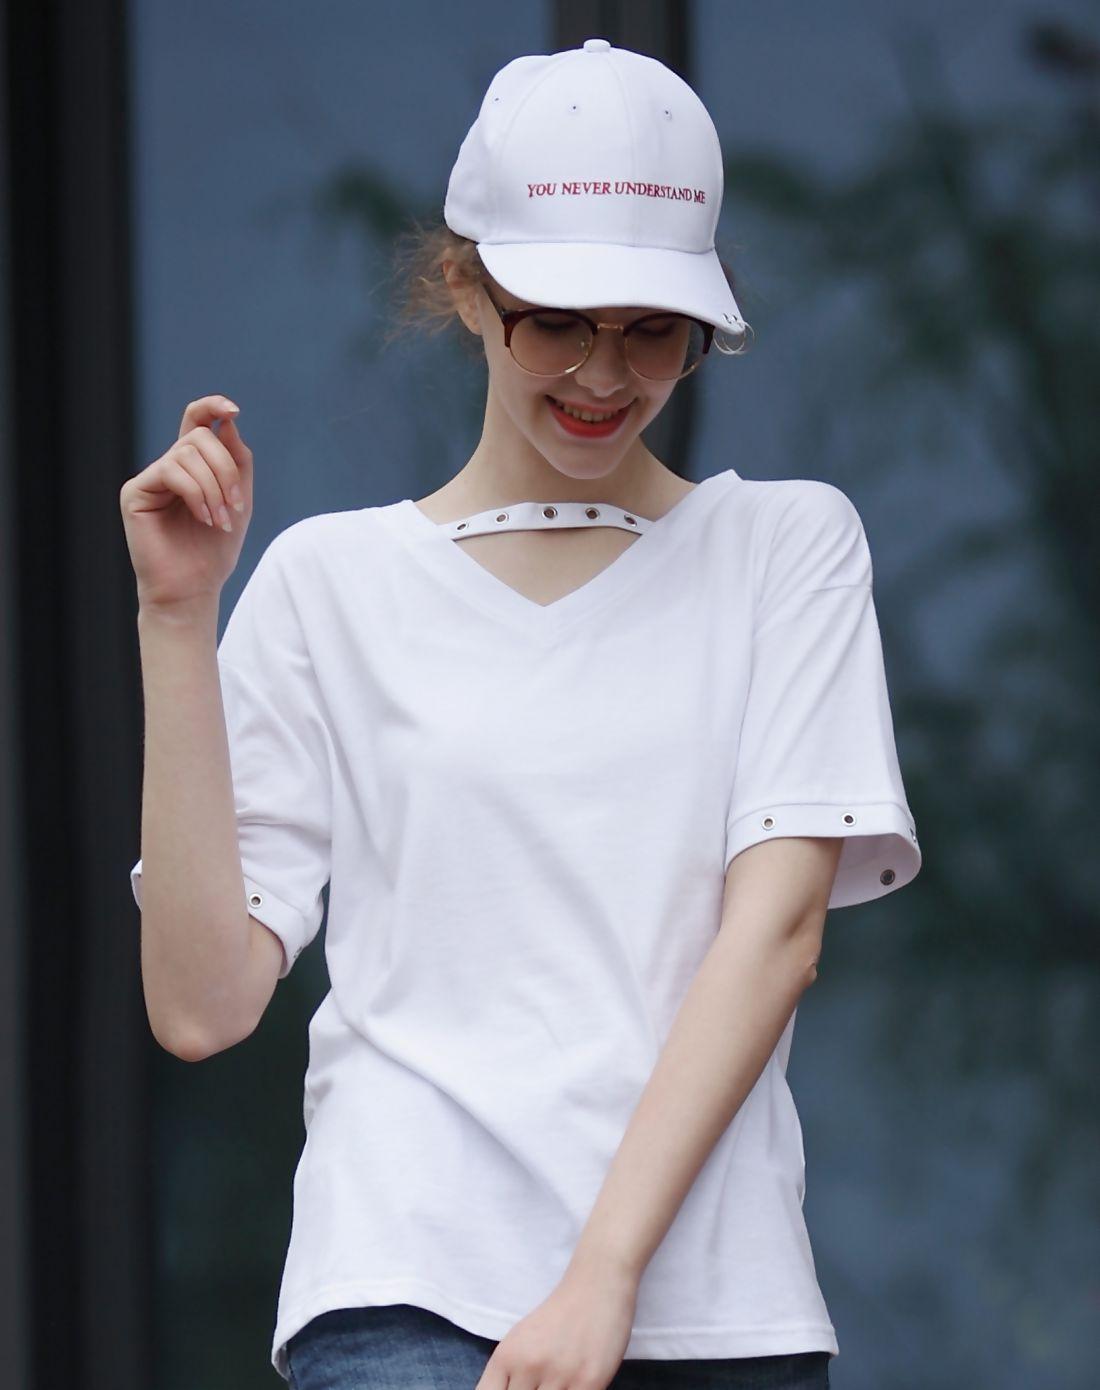 #AdoreWe #VIPme T-Shirts❤️Designer Qigirl White V Neck Cut Out Plain Cotton T-Shirt - AdoreWe.com